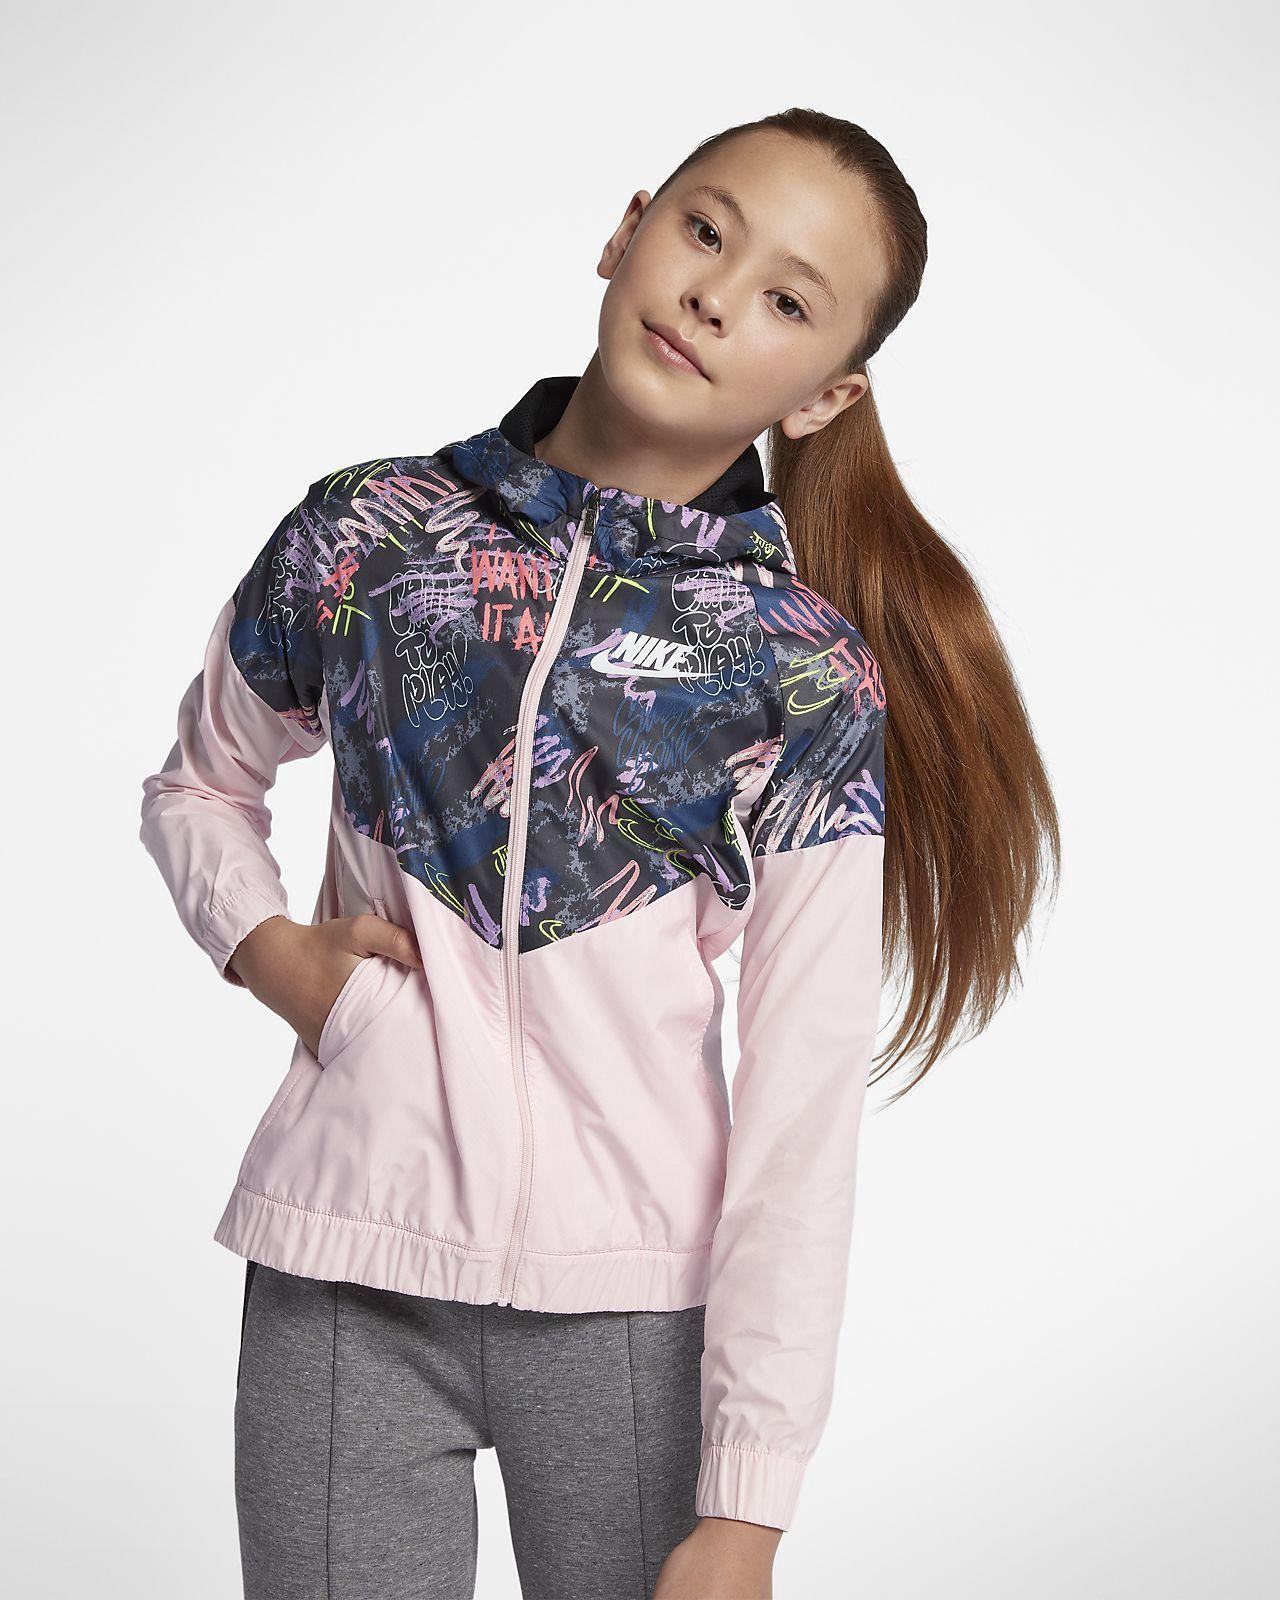 55e18710a5126 Nike Sportswear Windrunner Big Kids' (Girls') Printed Jacket - M (10-12)